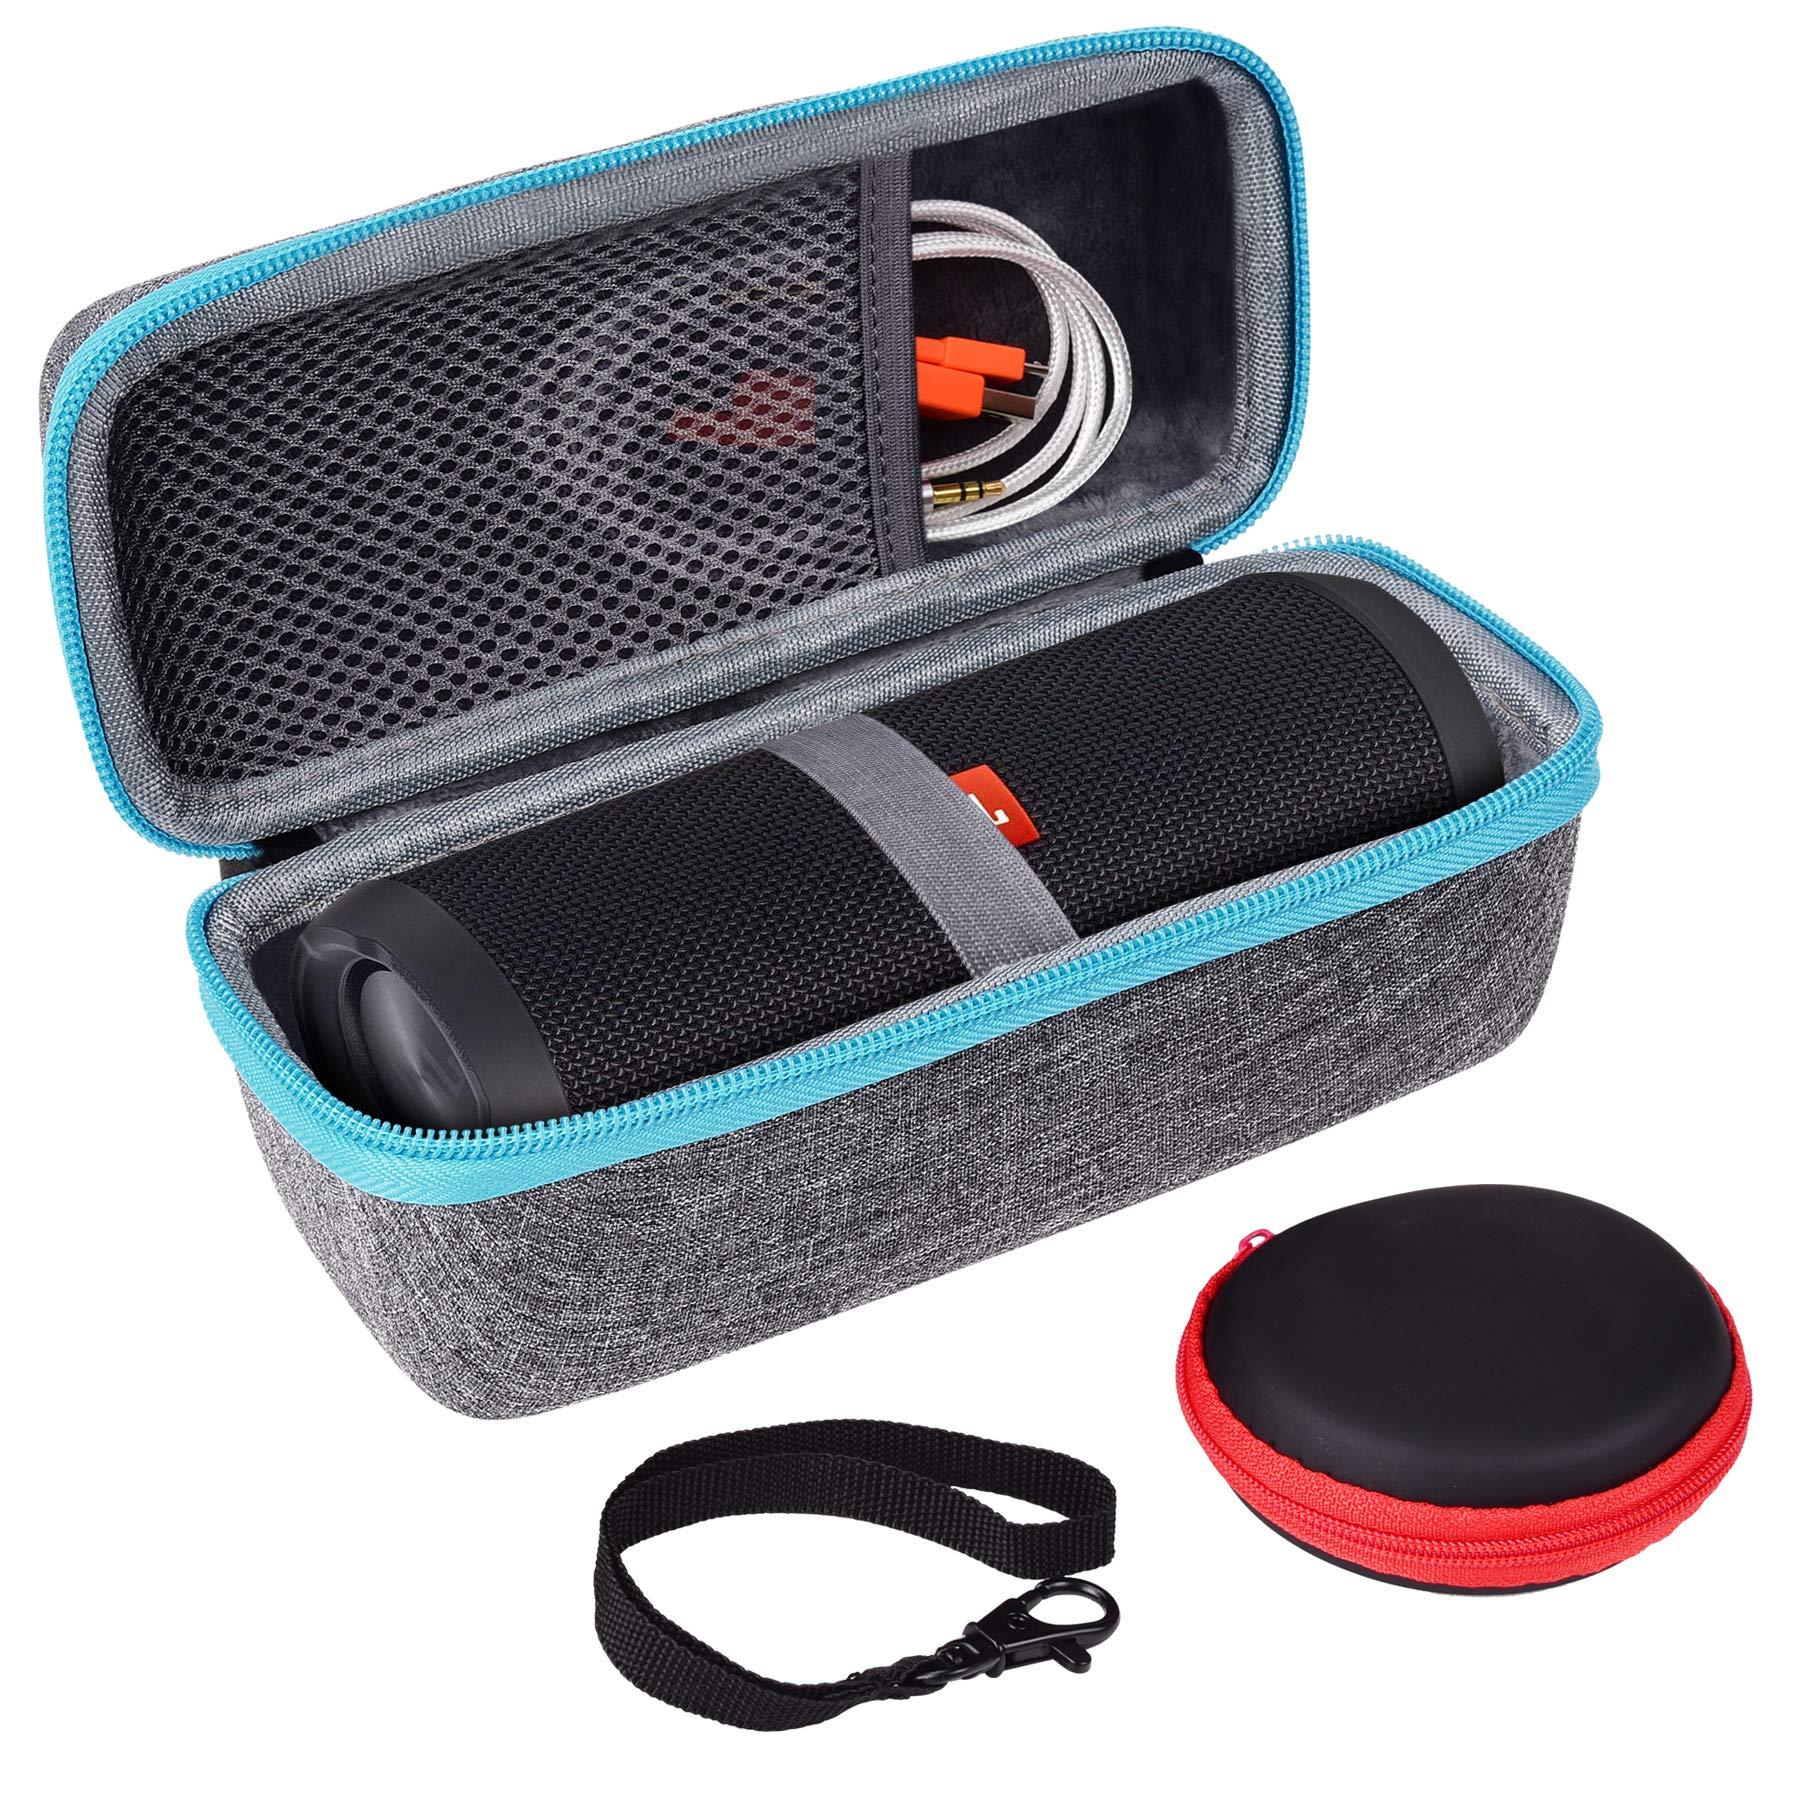 LTGEM Carrying Case For JBL Flip 3 or Flip 4 Wireless Bluetooth Portable Speaker